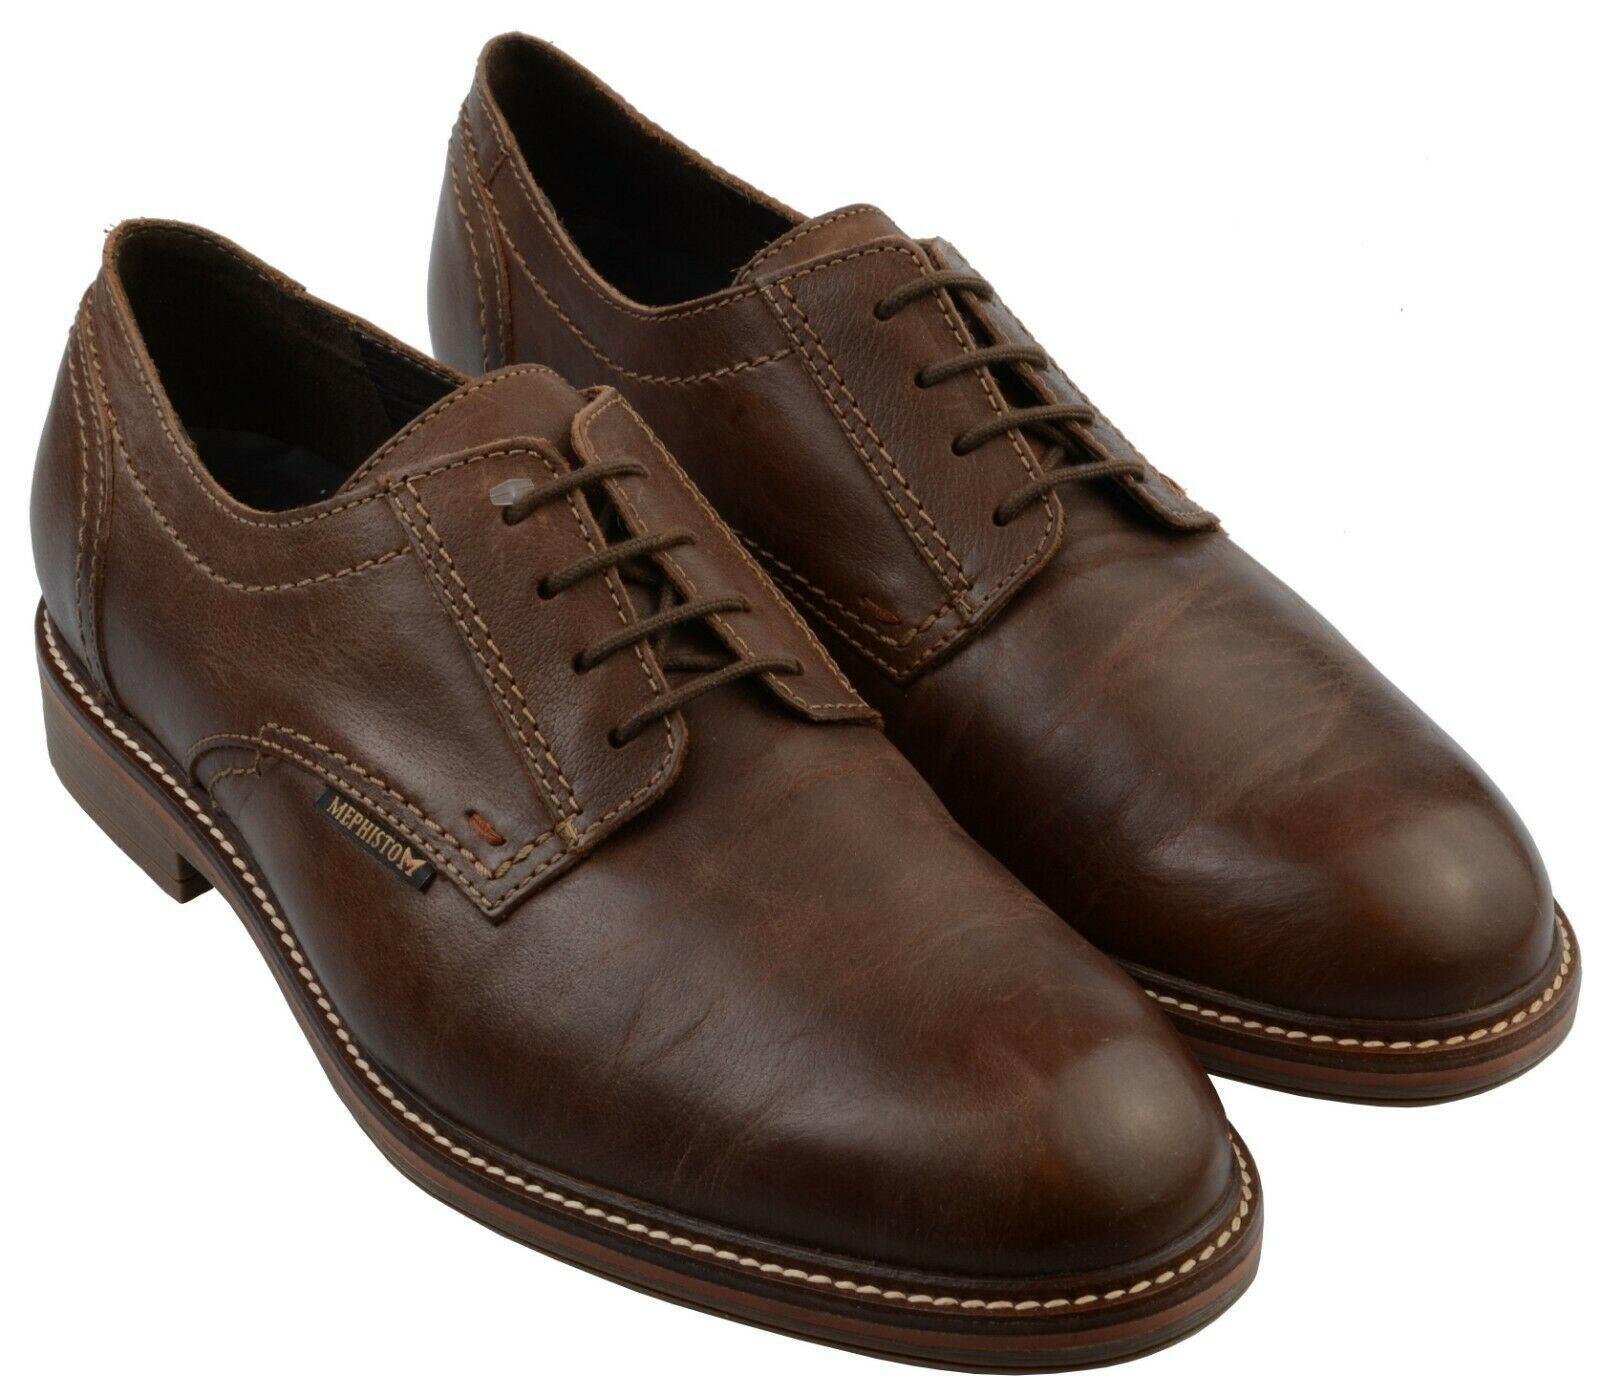 Zapato Con Cordones Formal de Gentleman Mephisto Waino Avellana UK Talla 10